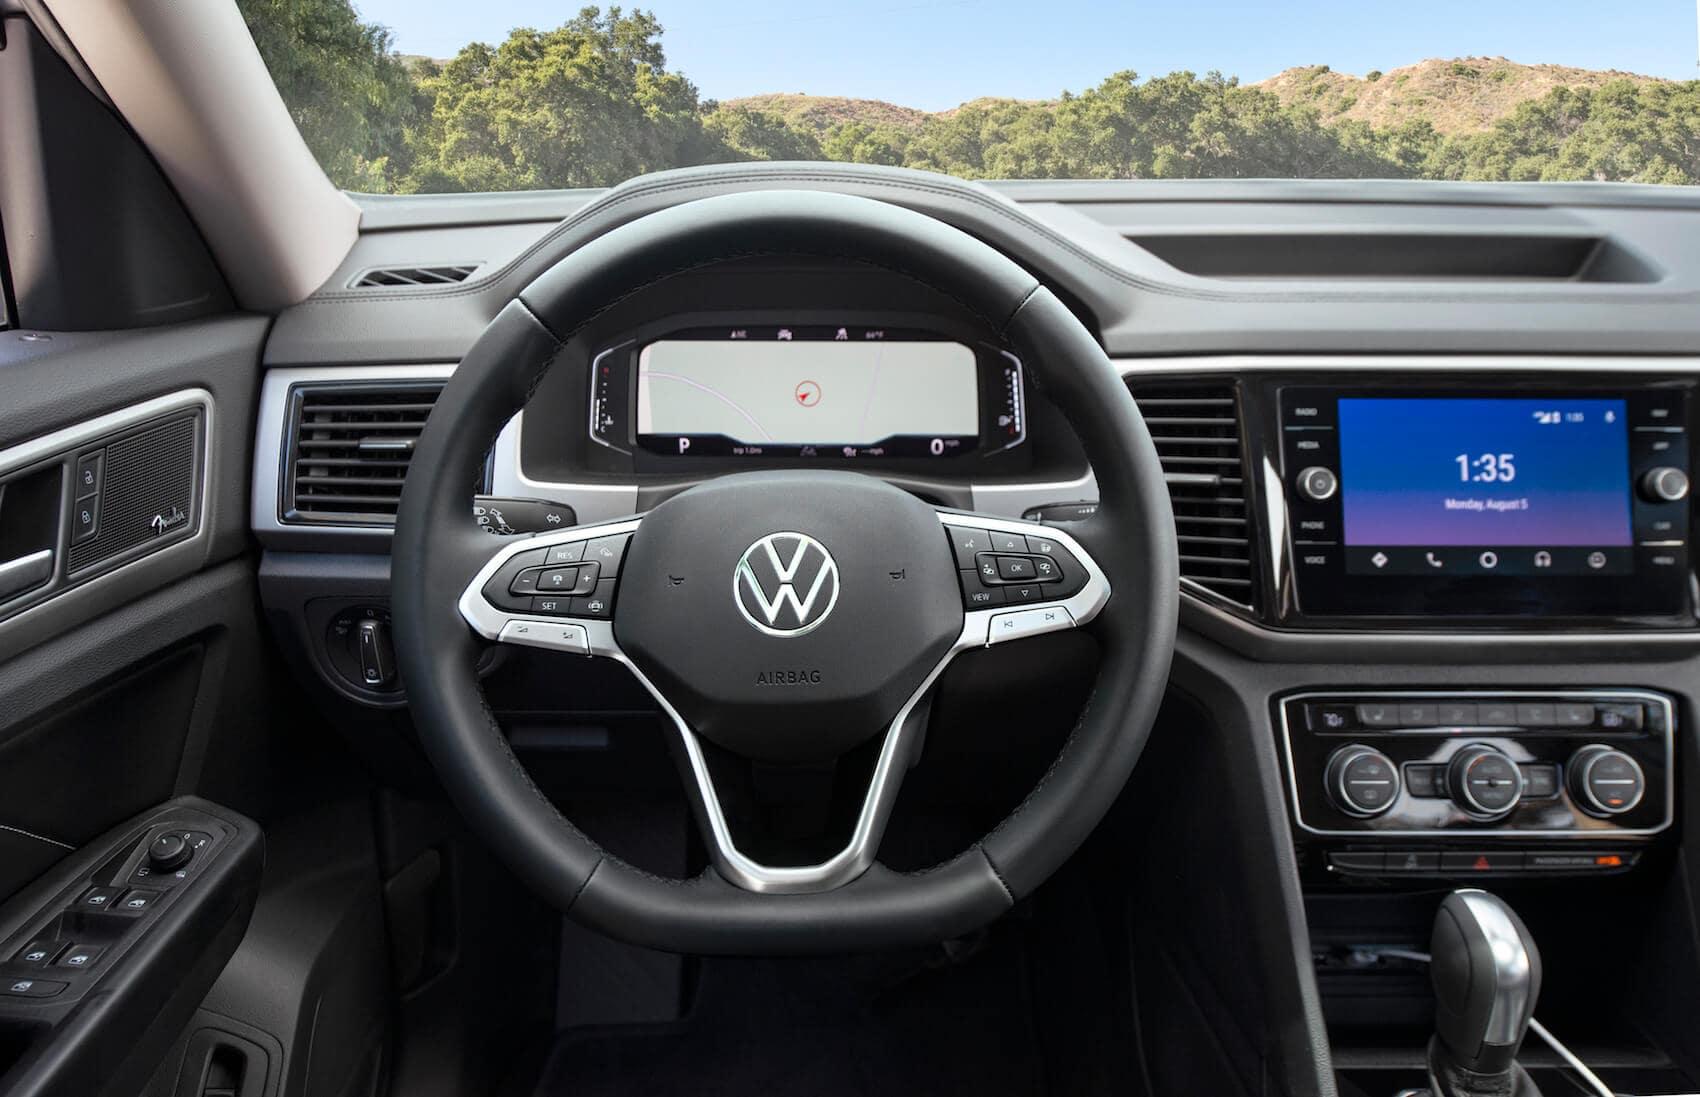 2021 Volkswagen Atlas technology